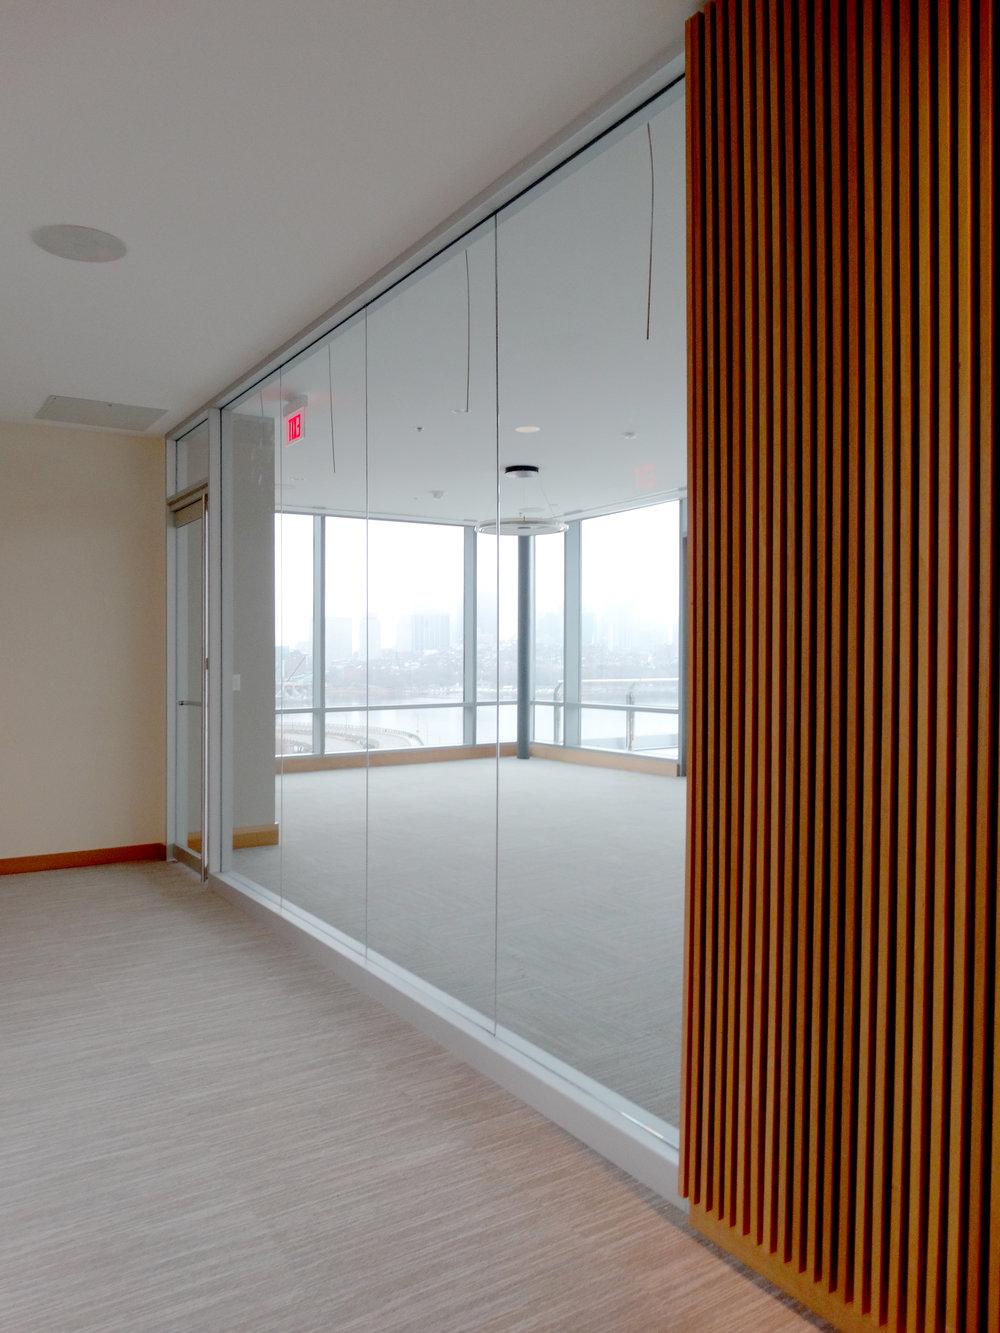 Encase Aluminum Framed Glass Millwork Wall - Spaceworks AI.jpg